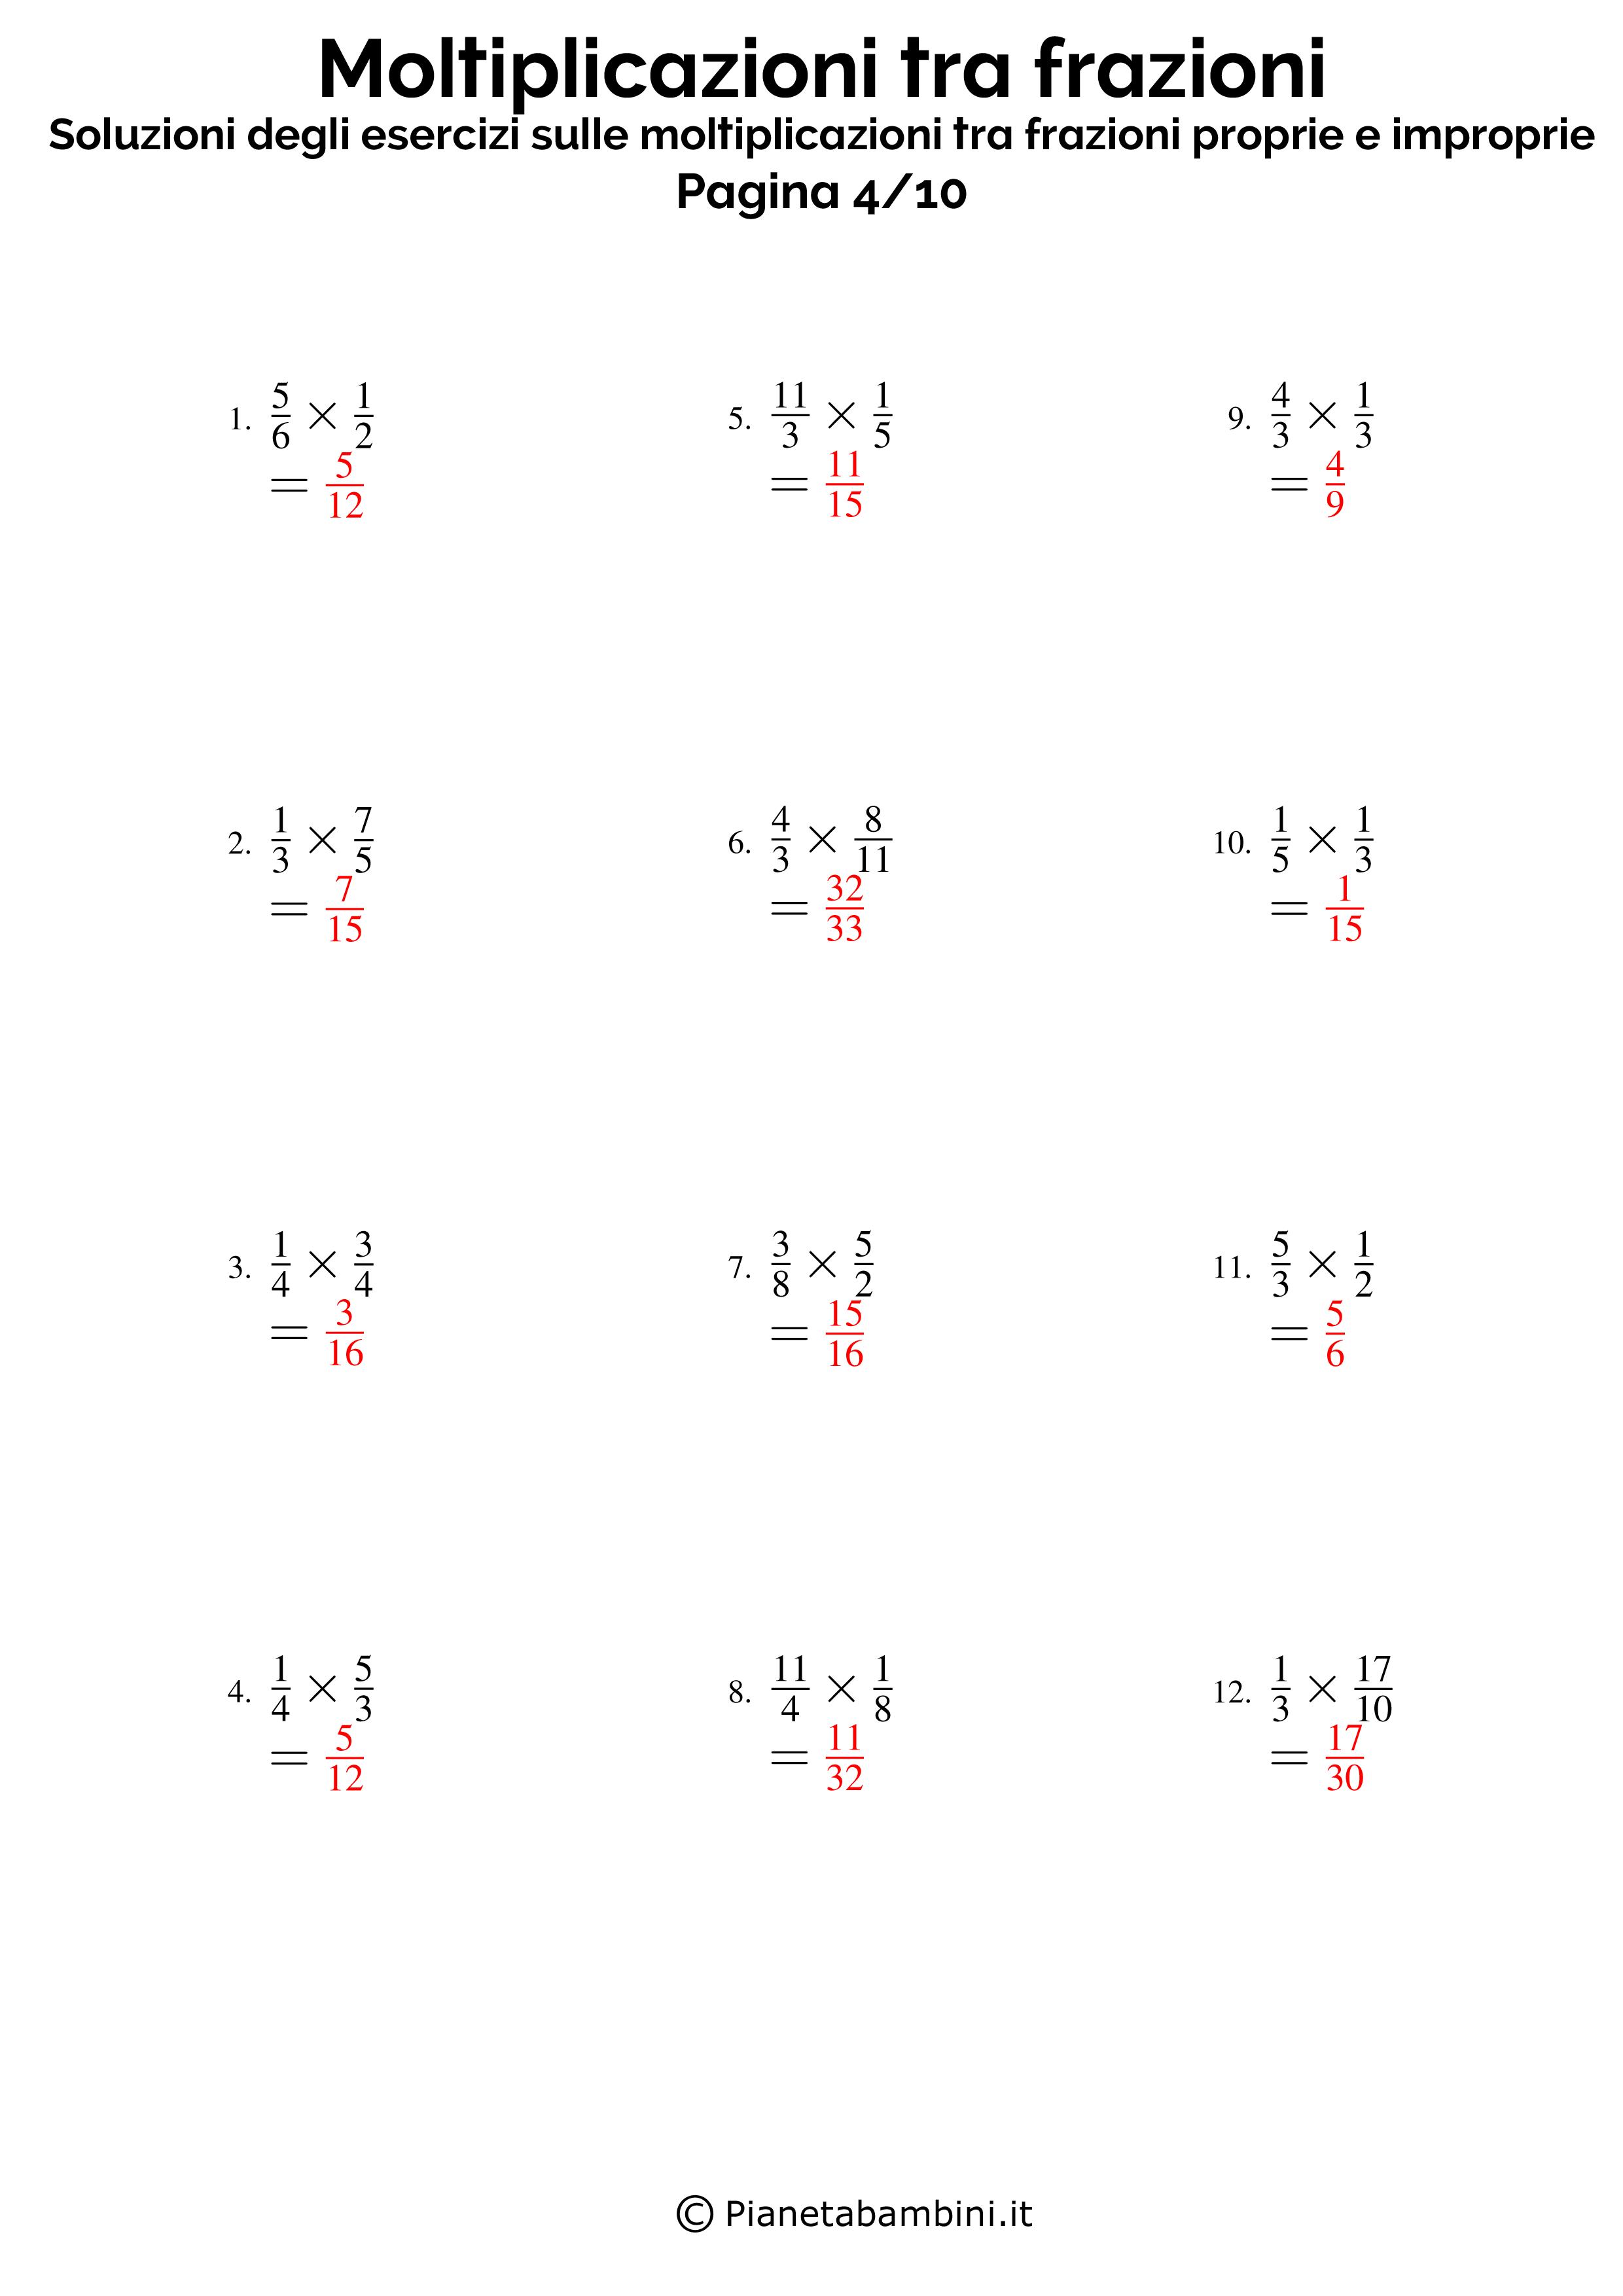 Soluzioni-Moltiplicazioni-Frazioni-Proprie-Improprie_04